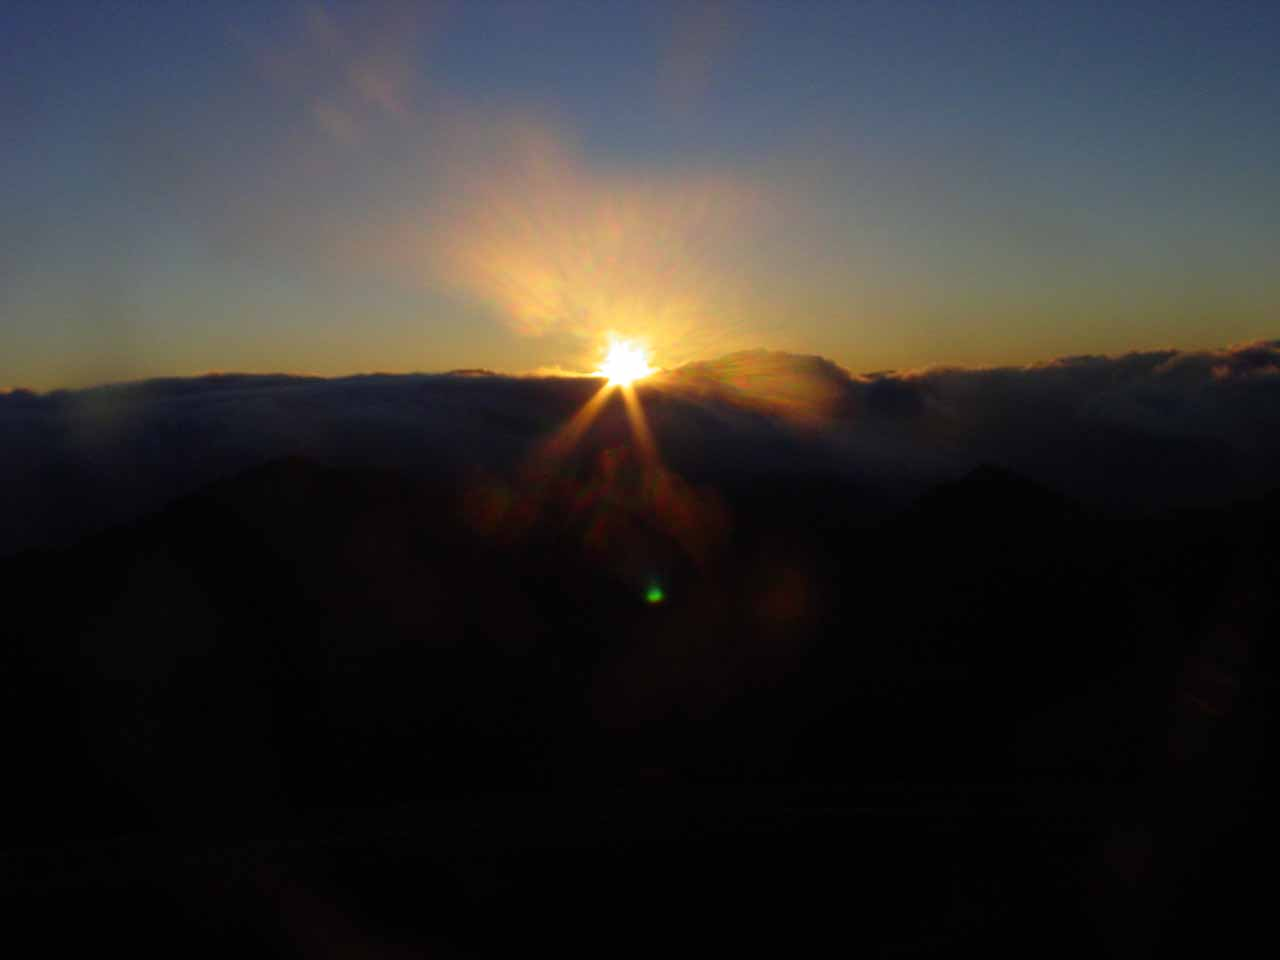 Sunrise over the clouds atop Haleakala